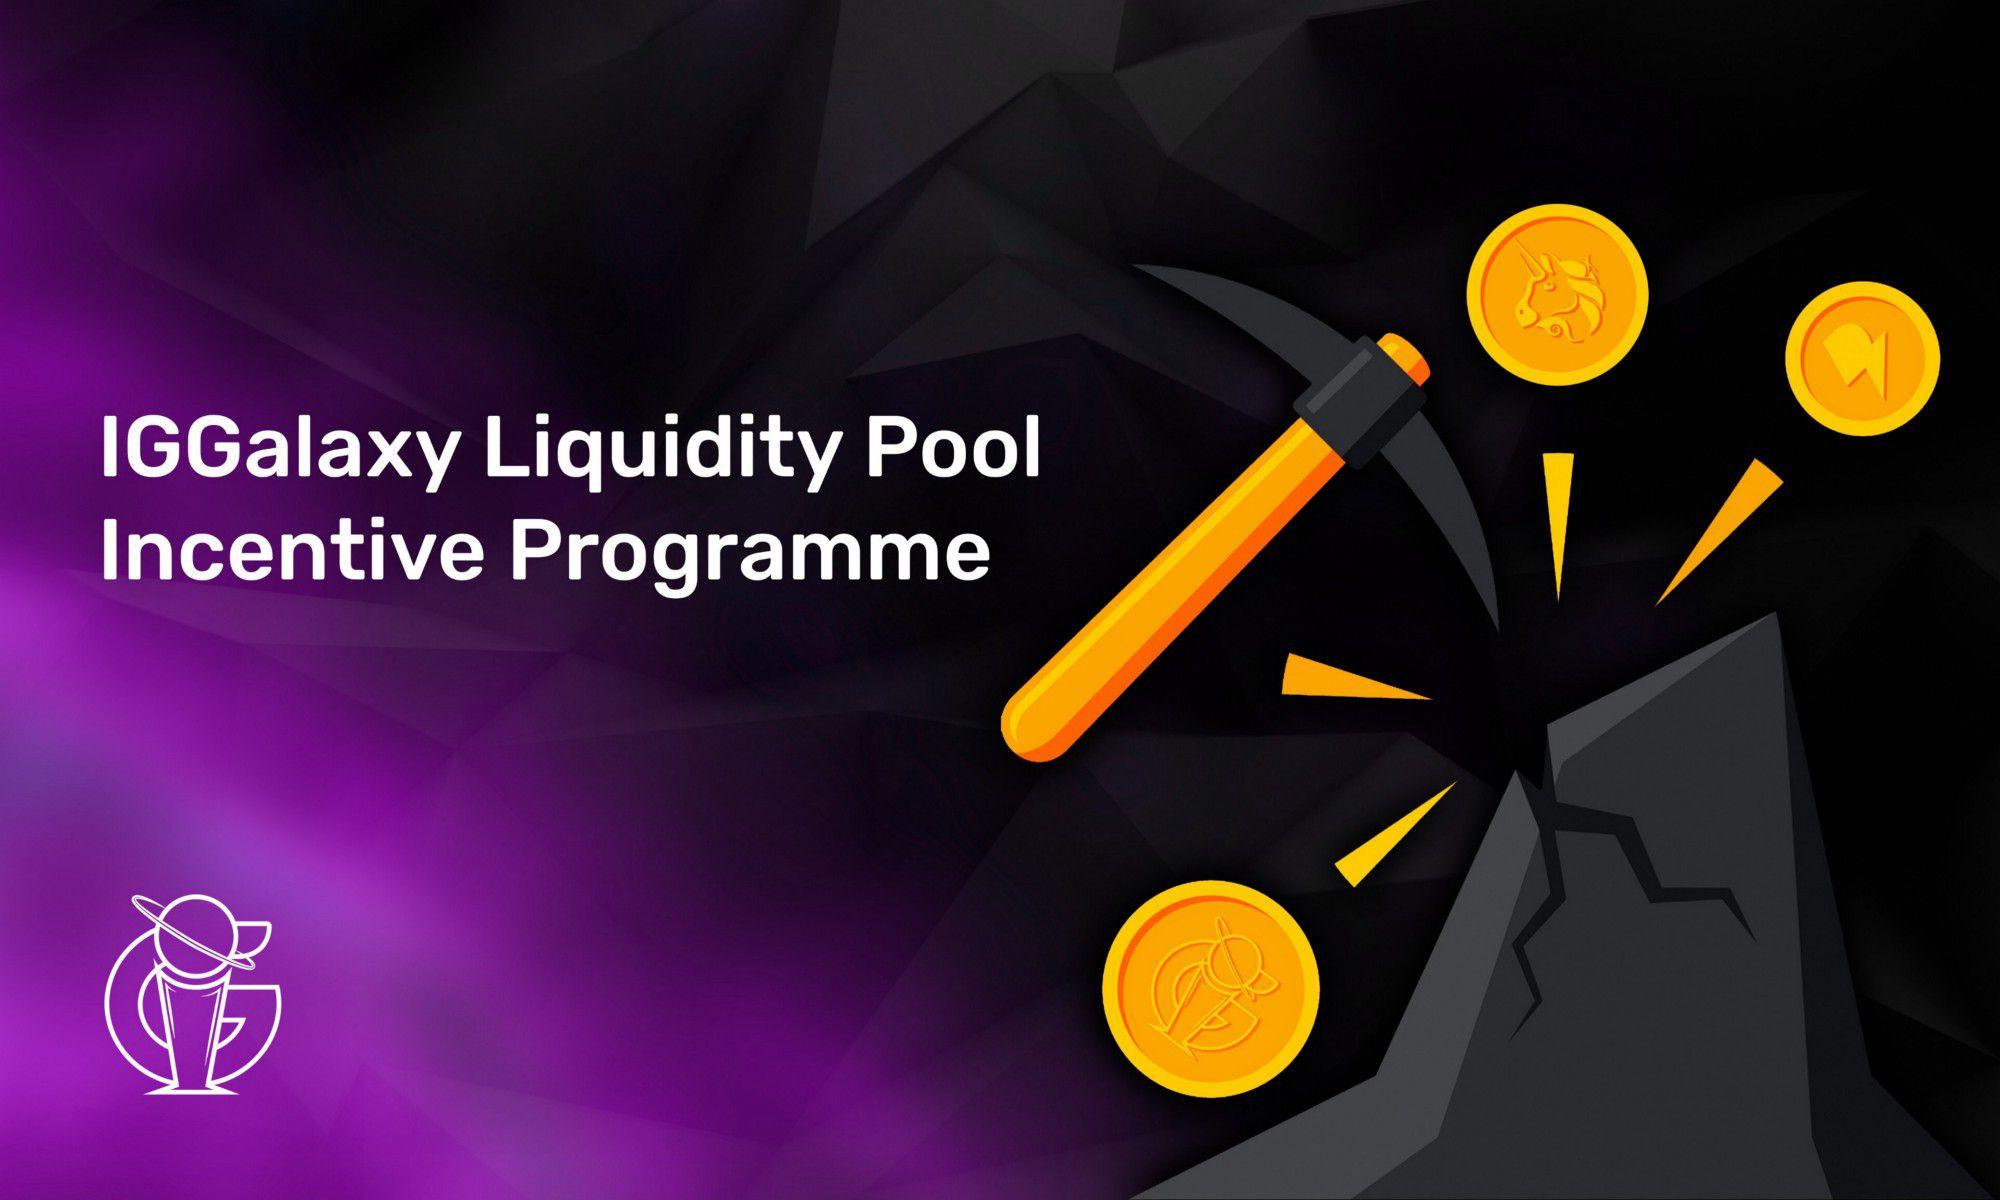 IGGalaxy liquidity pool incentive programme.